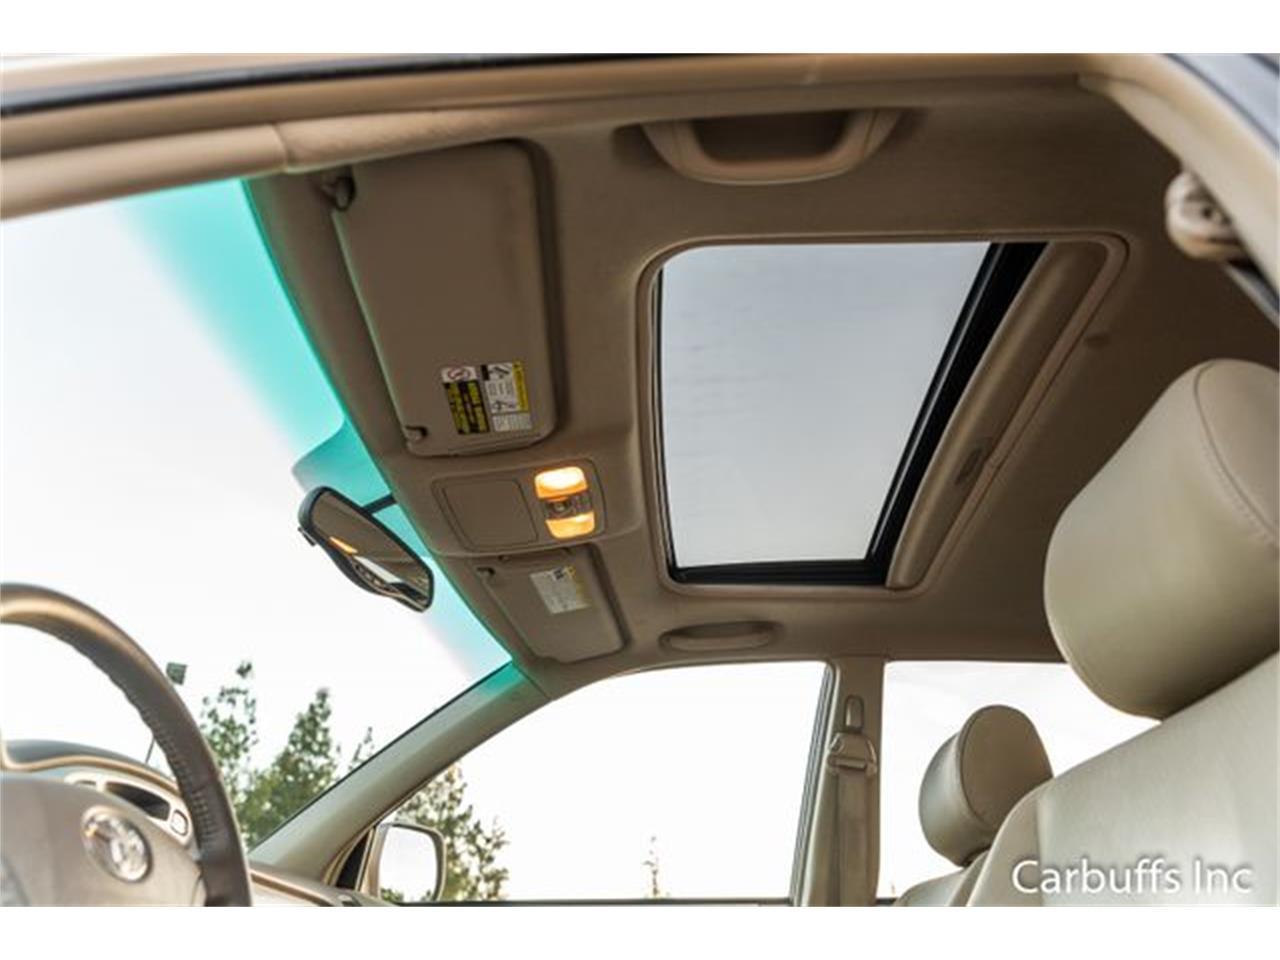 2006 Toyota Highlander (CC-1262972) for sale in Concord, California